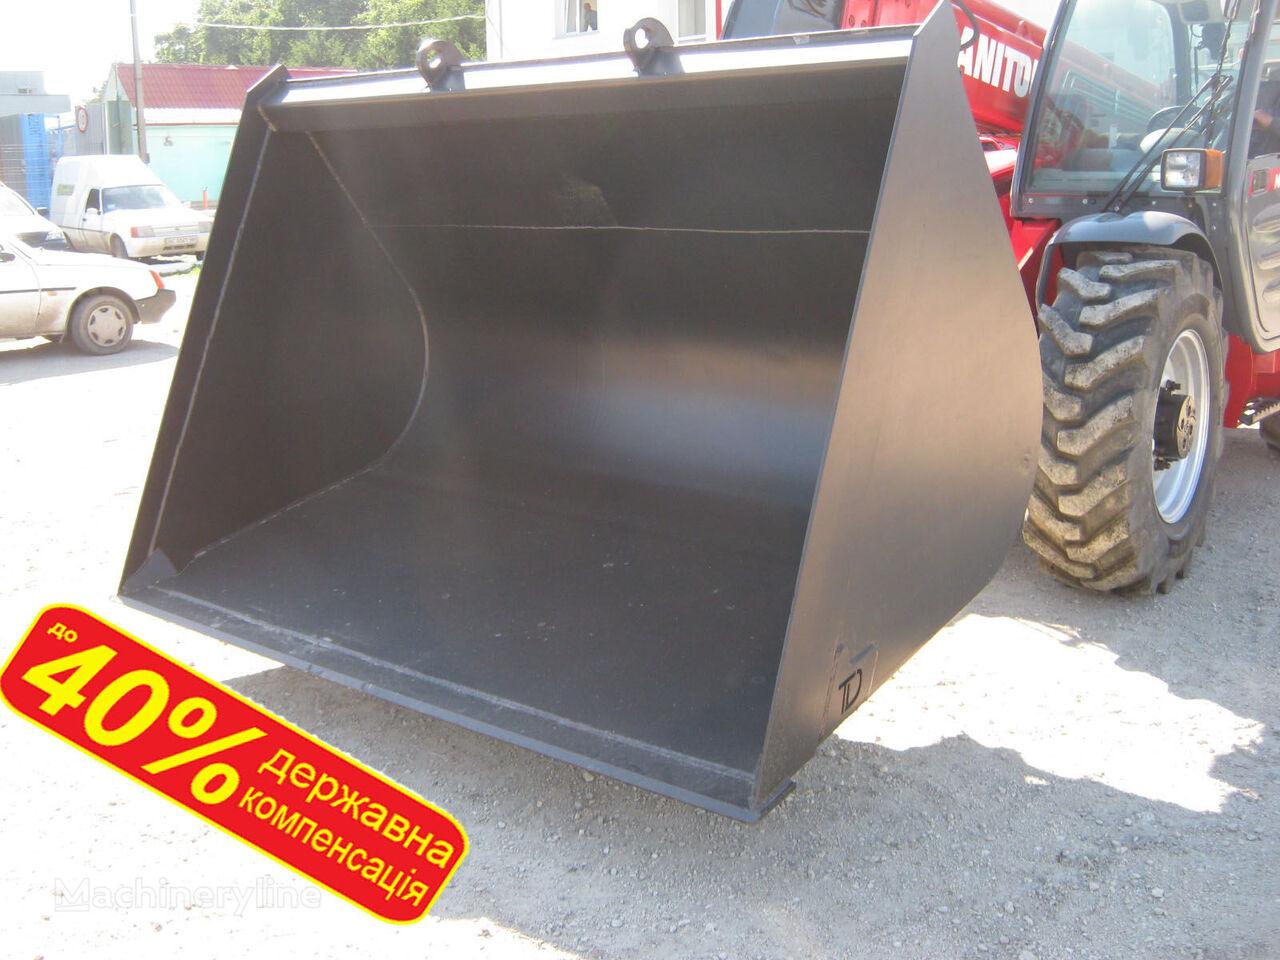 new MANITOU  JCB, Bobcat, HAULOTTE, CLAAS - Kovshi zernovye front loader bucket